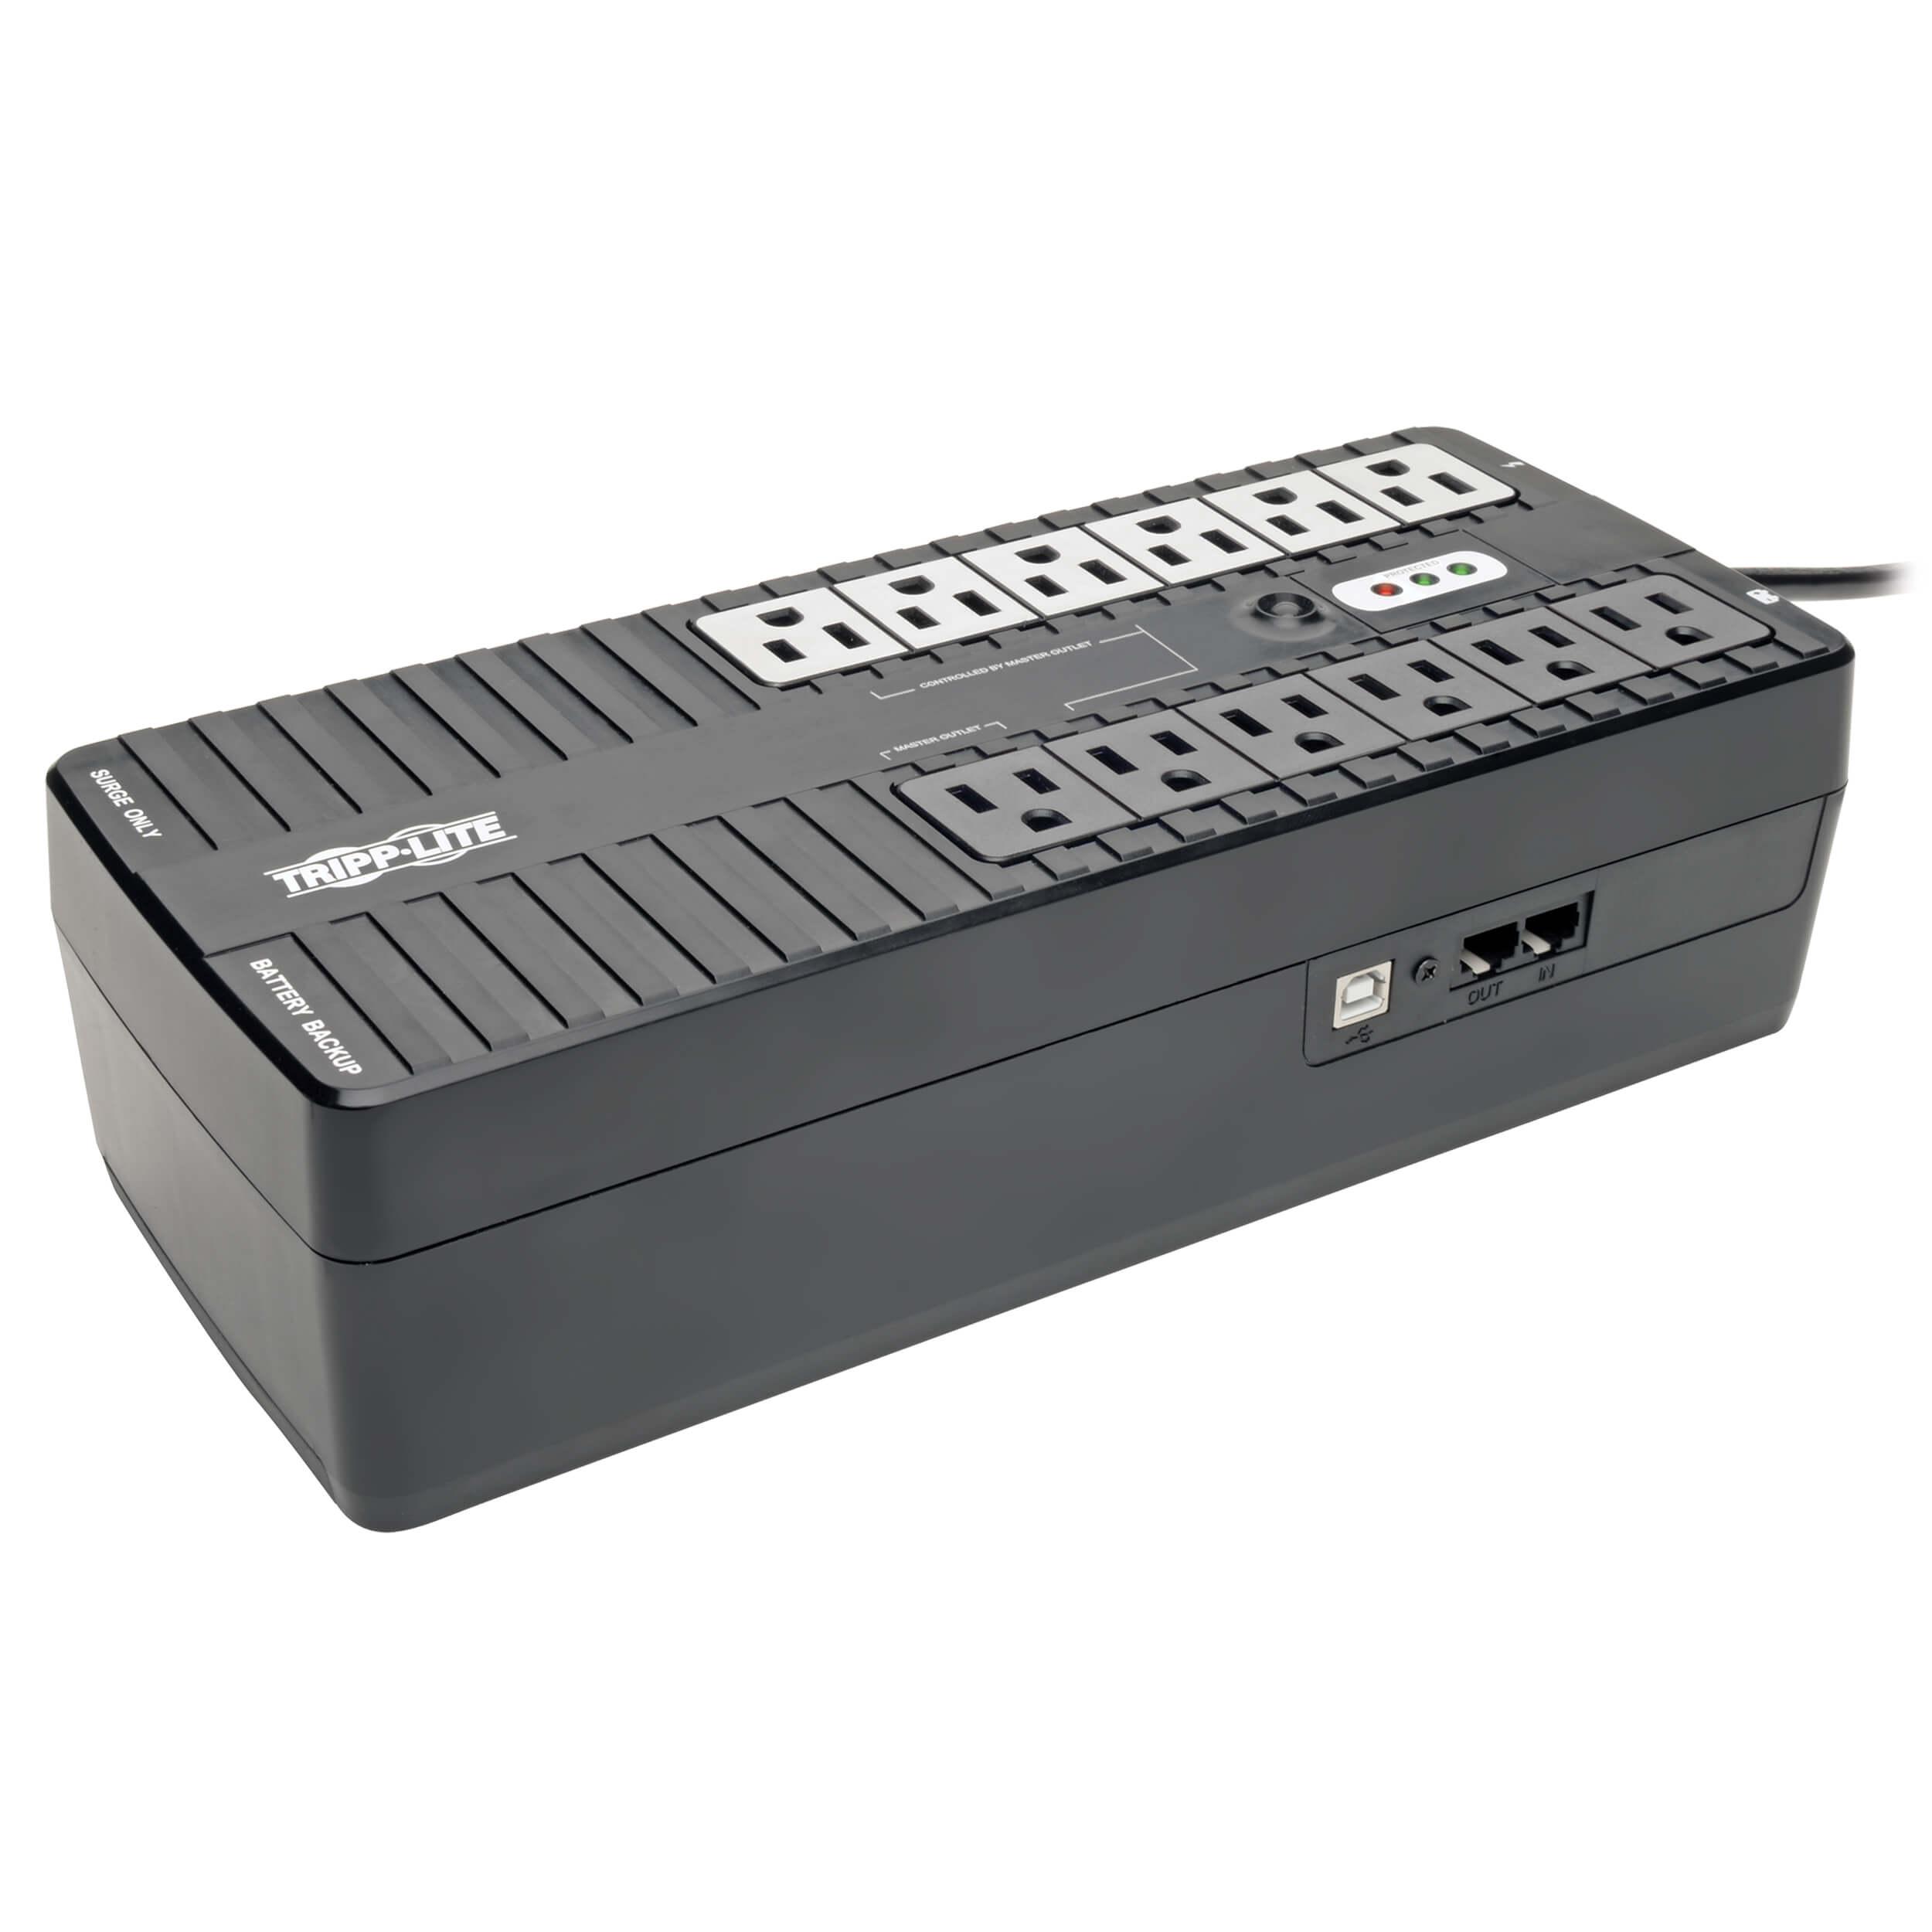 6 Outlet / 6 Surge UPS Power Backup Wave Electronics